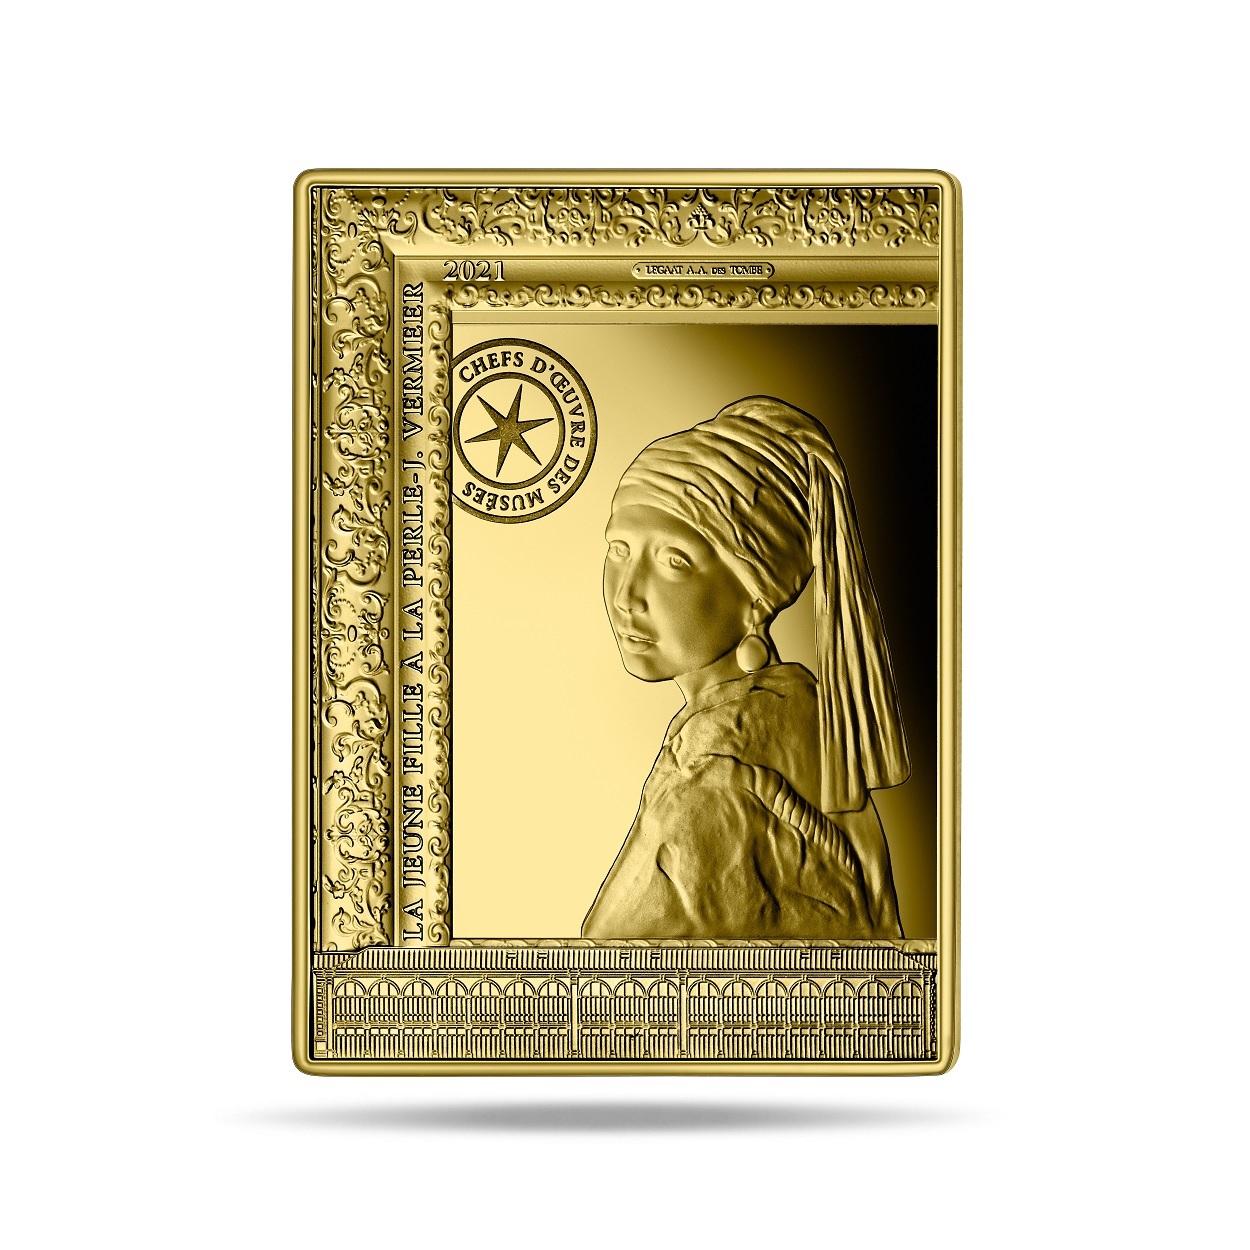 (EUR07.Proof.2021.10041356350000) 50 euro France 2021 Proof gold - Johannes Vermeer Reverse (zoom)